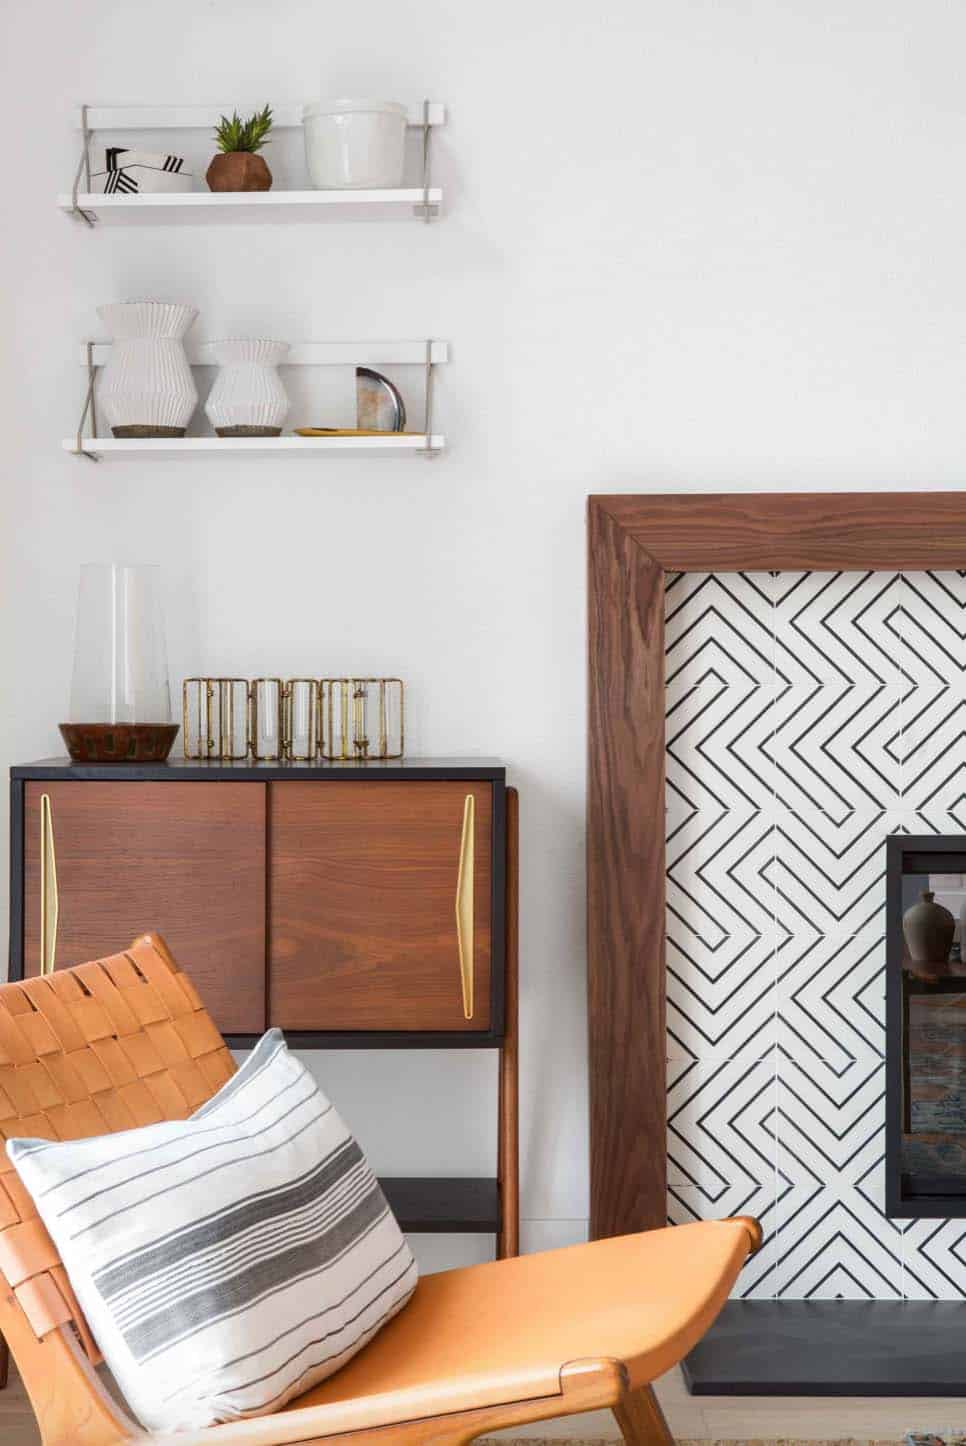 California Eclectic Home-Lindye Galloway Interiors-06-1 Kindesign